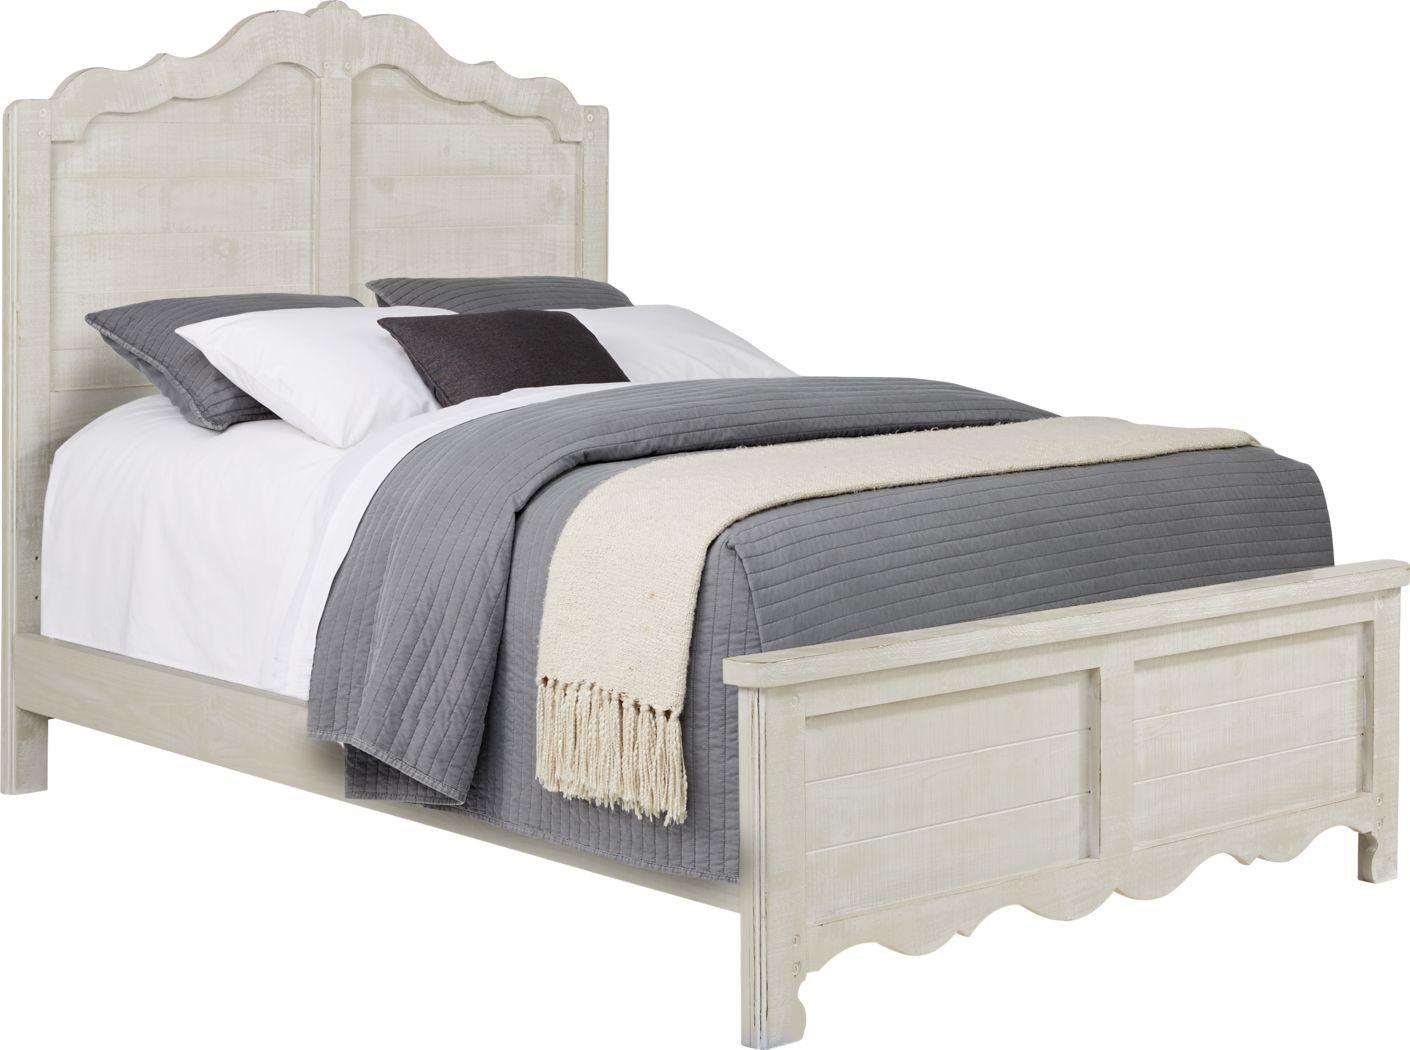 Kids Caraway Cove Gray 3 Pc Full Panel Bed